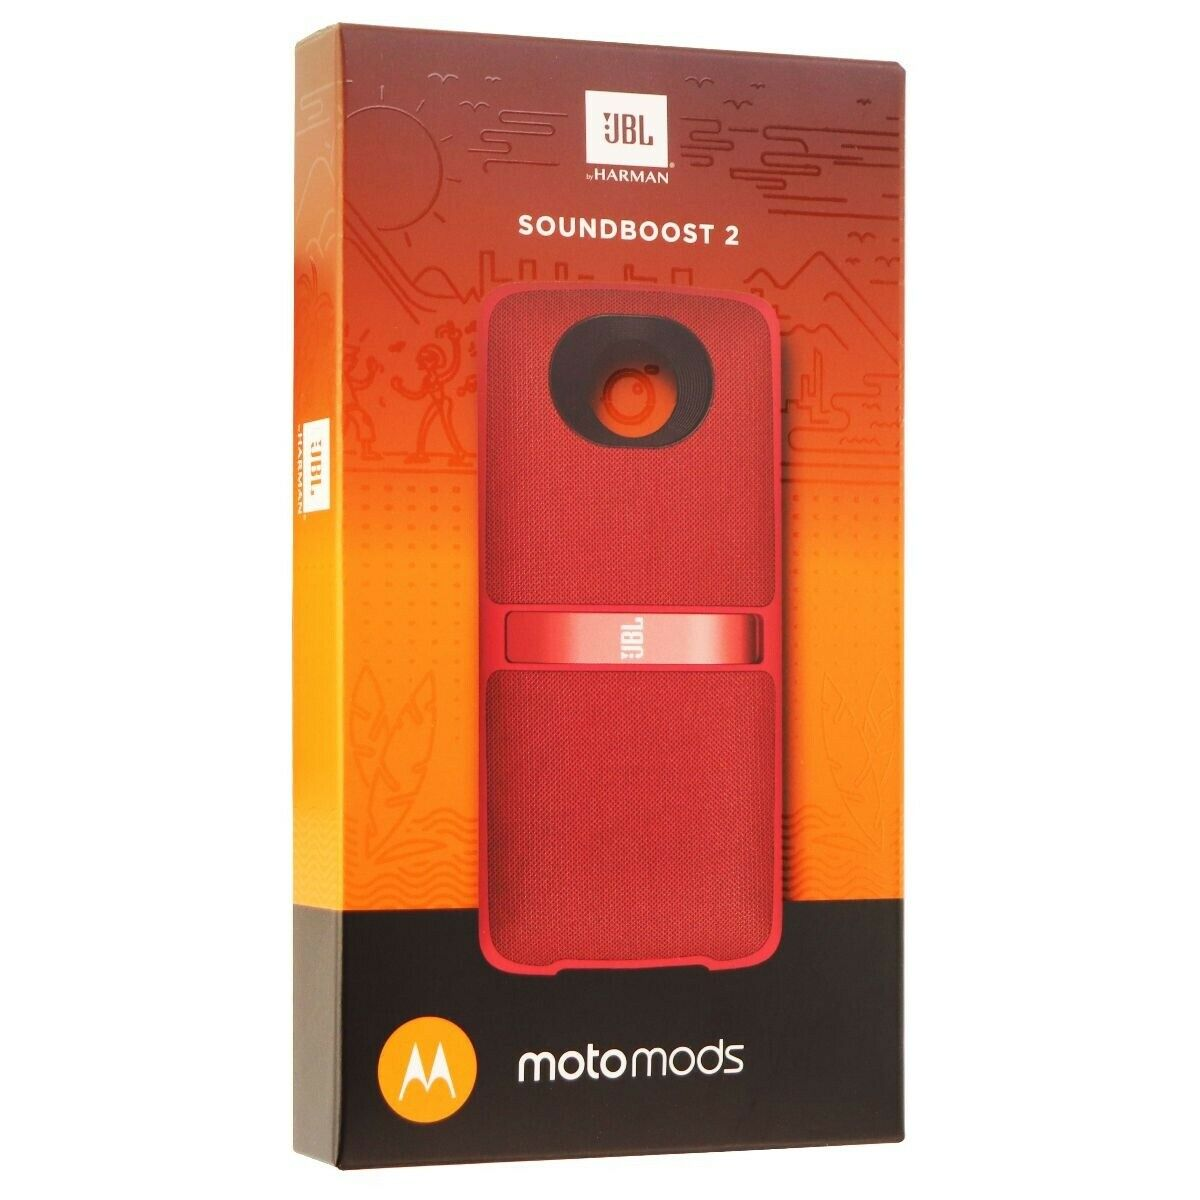 JBL MotoMod Soundboost 2 Audio Speaker Mod for Motorola Moto